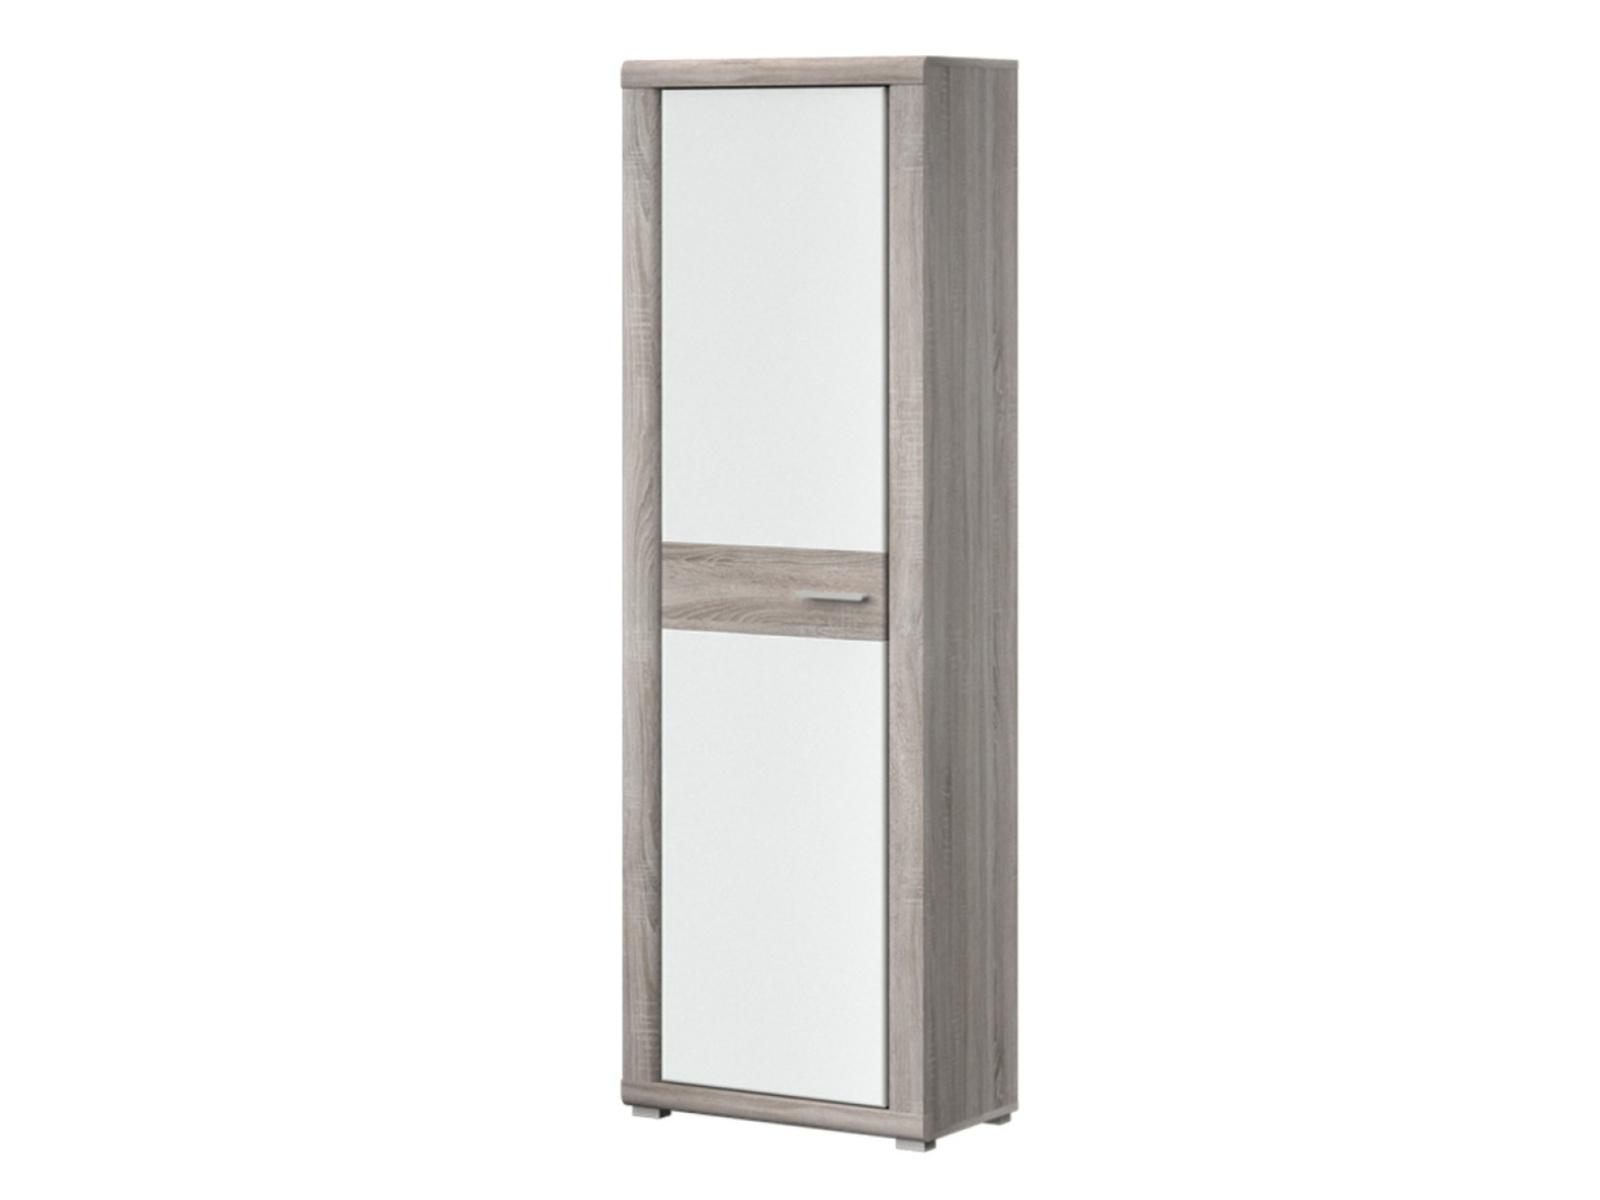 Decodom BELINGO typ 01 šatní skříň, dub bardolino/bílá